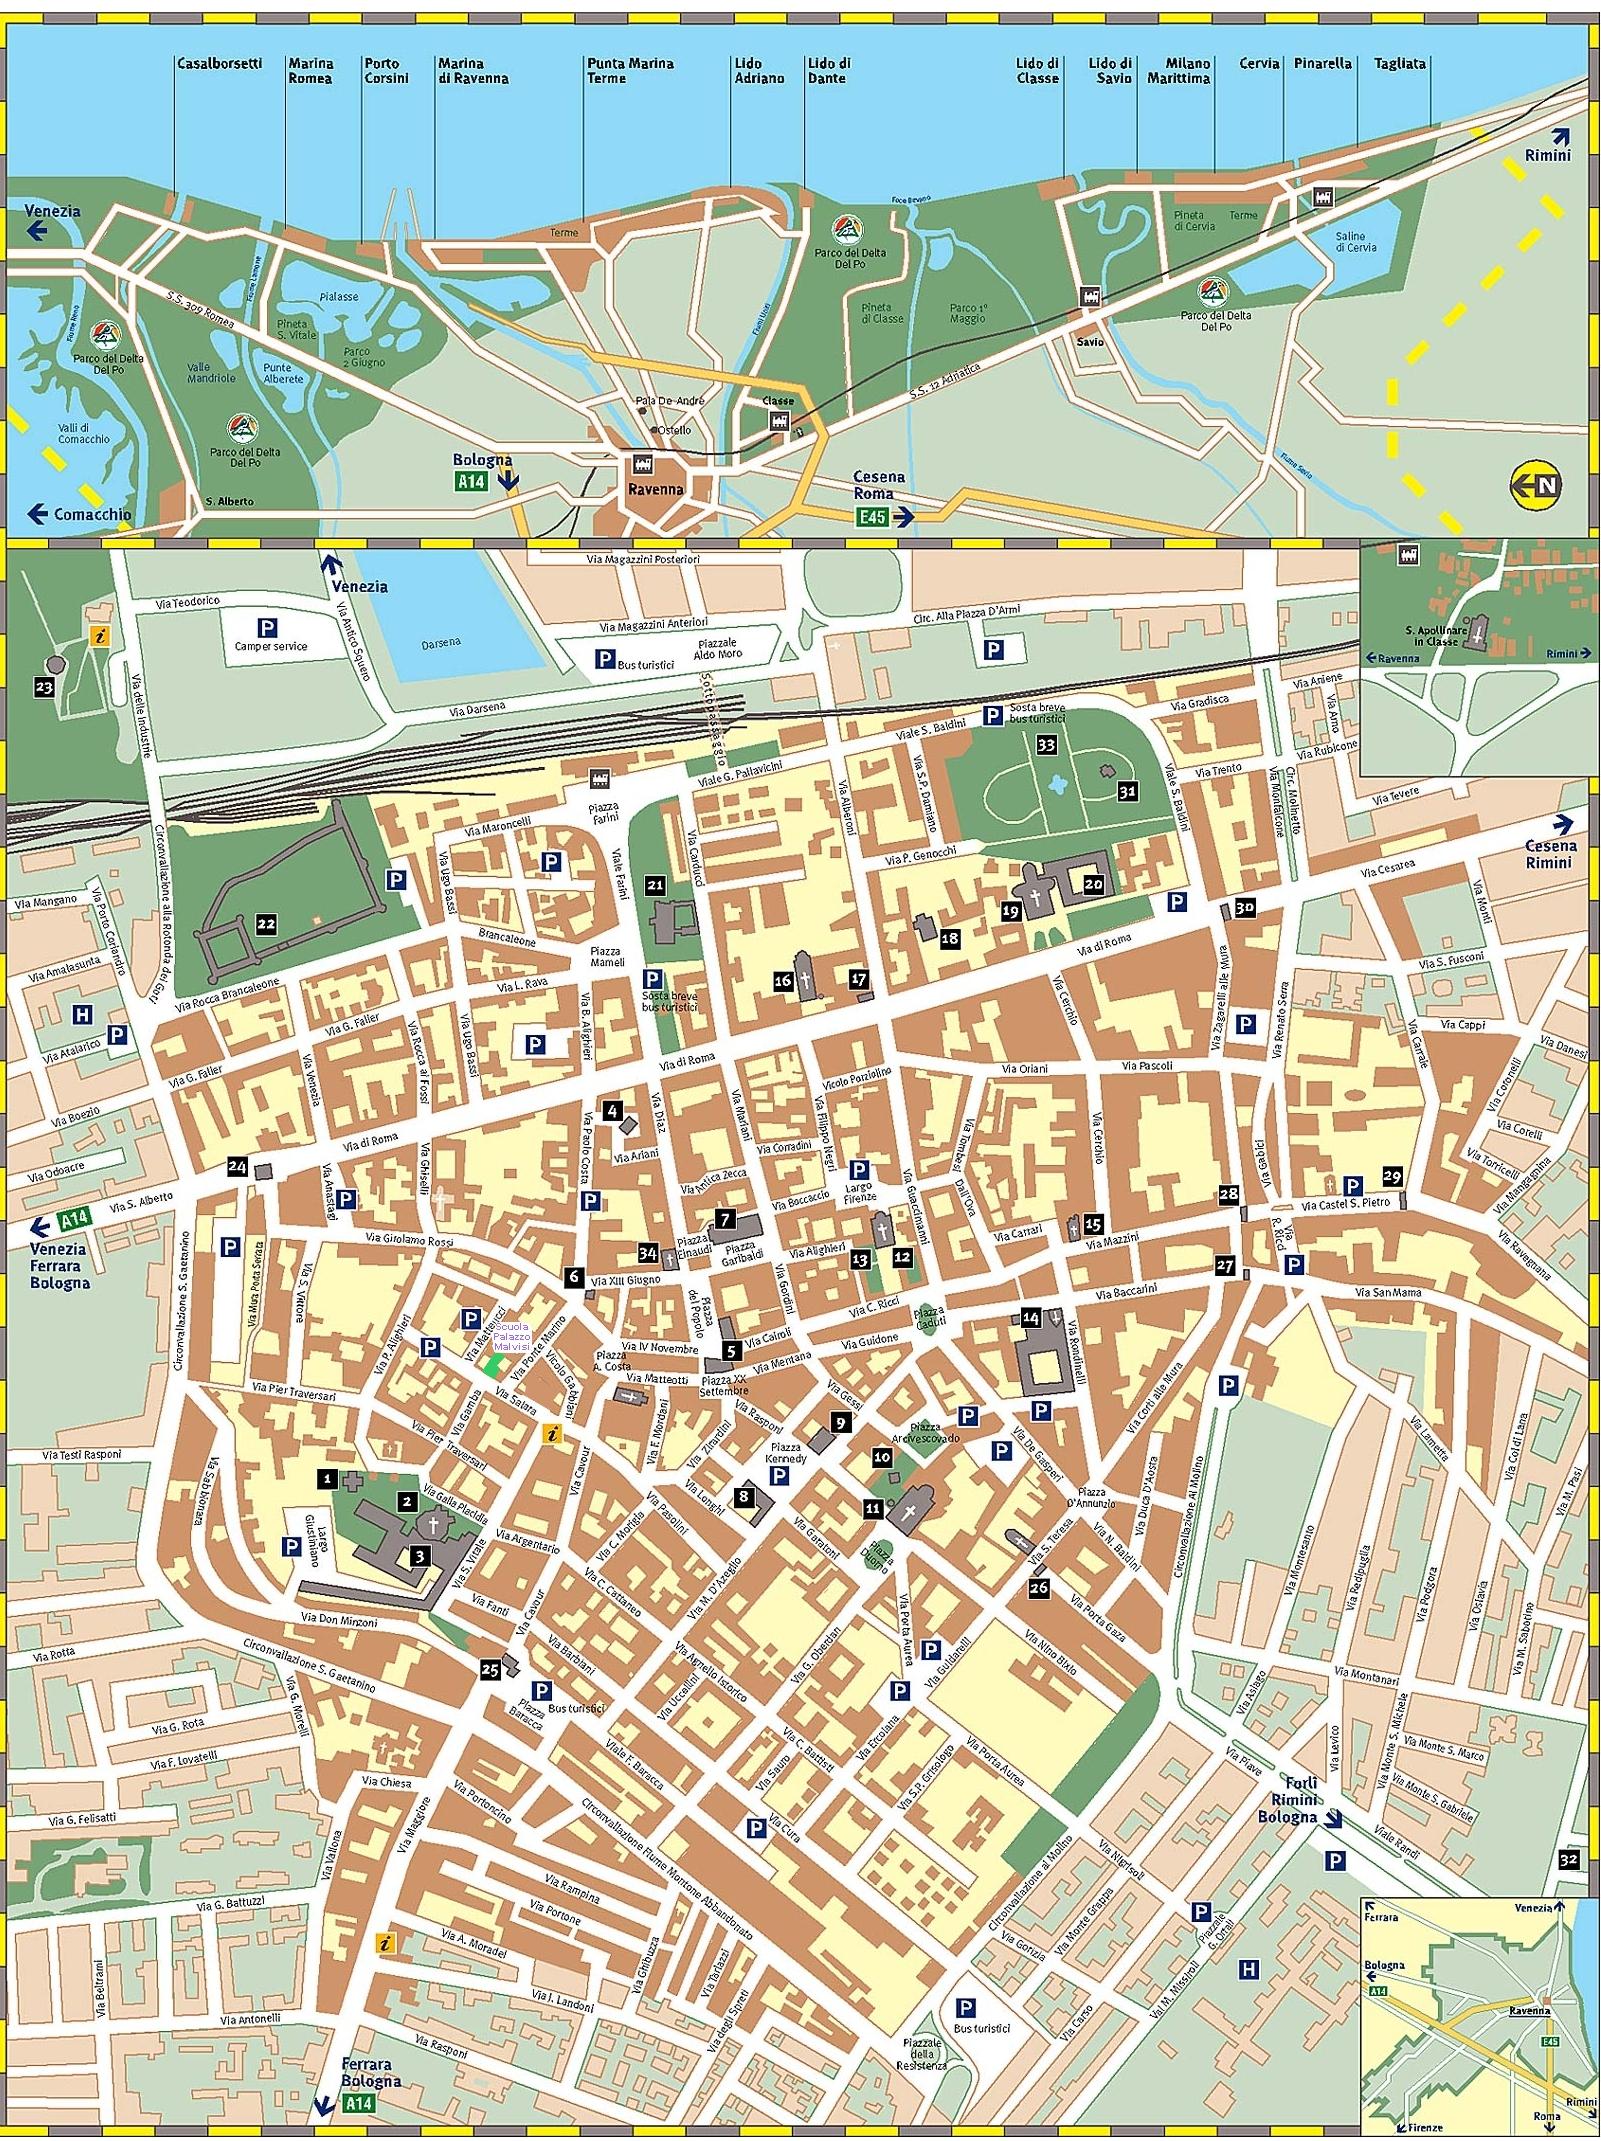 Ravenna Street Map Ravenna Italy mappery